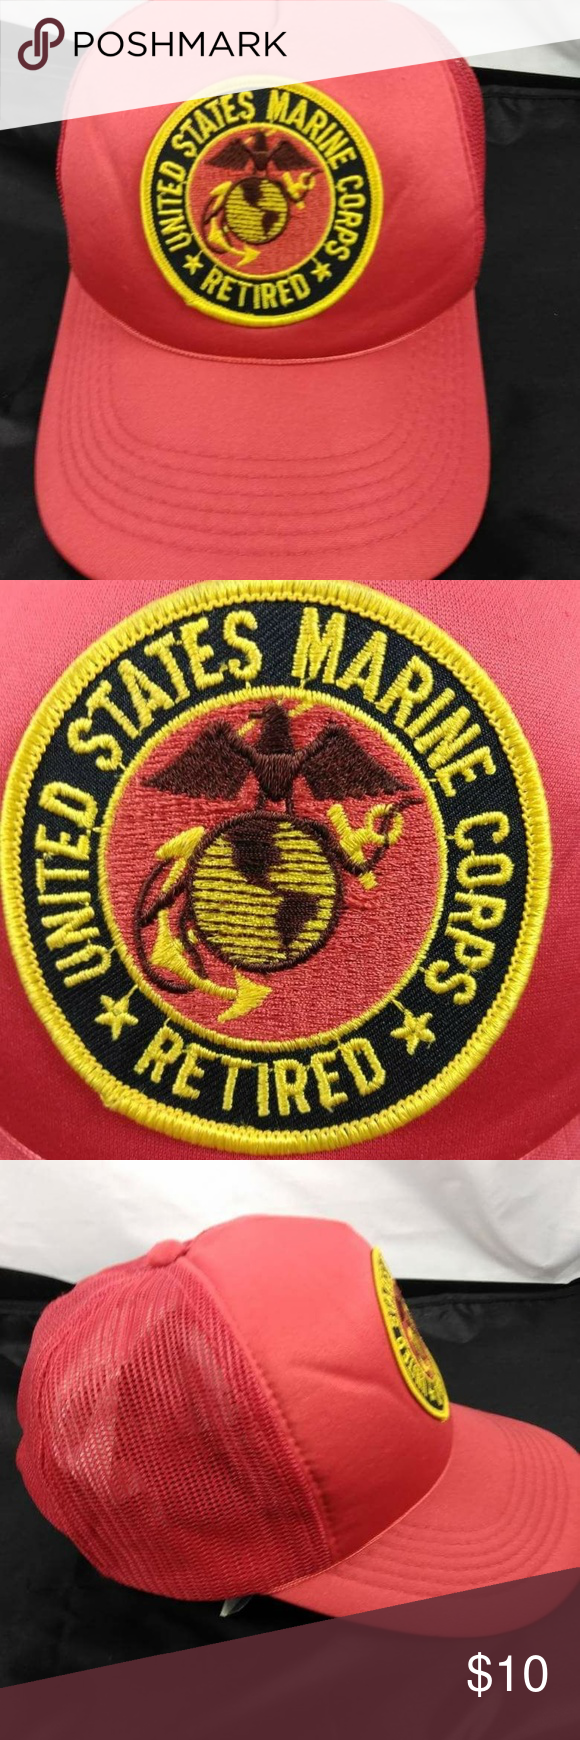 8f0b97d59f6 VTG Retired USMC YoungAn Hat Co. Snapback in 2018